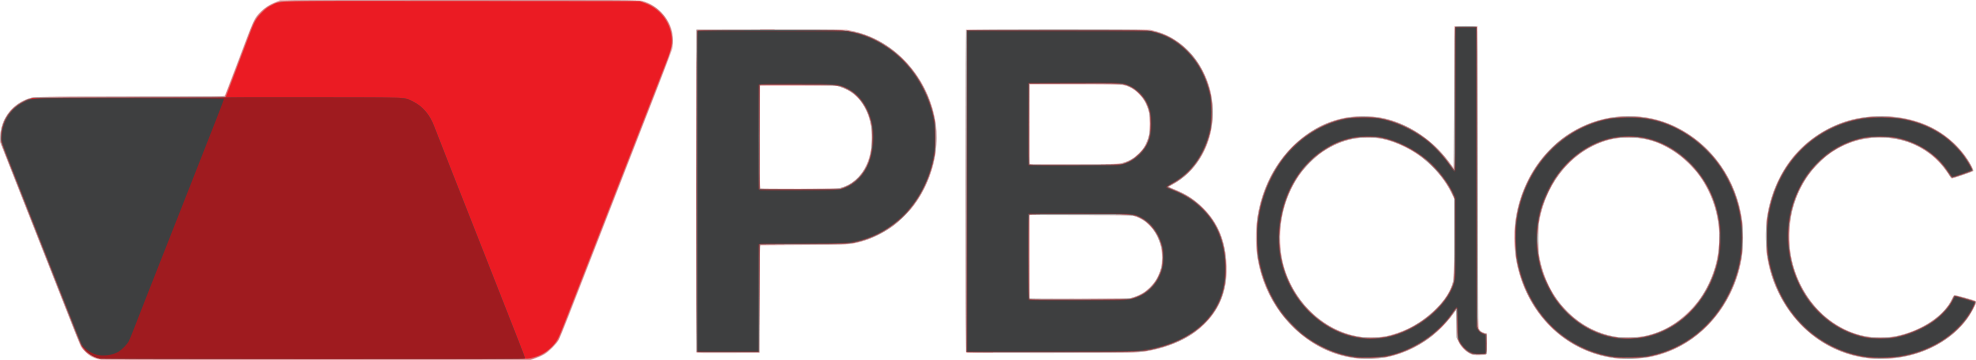 pbdoc.png